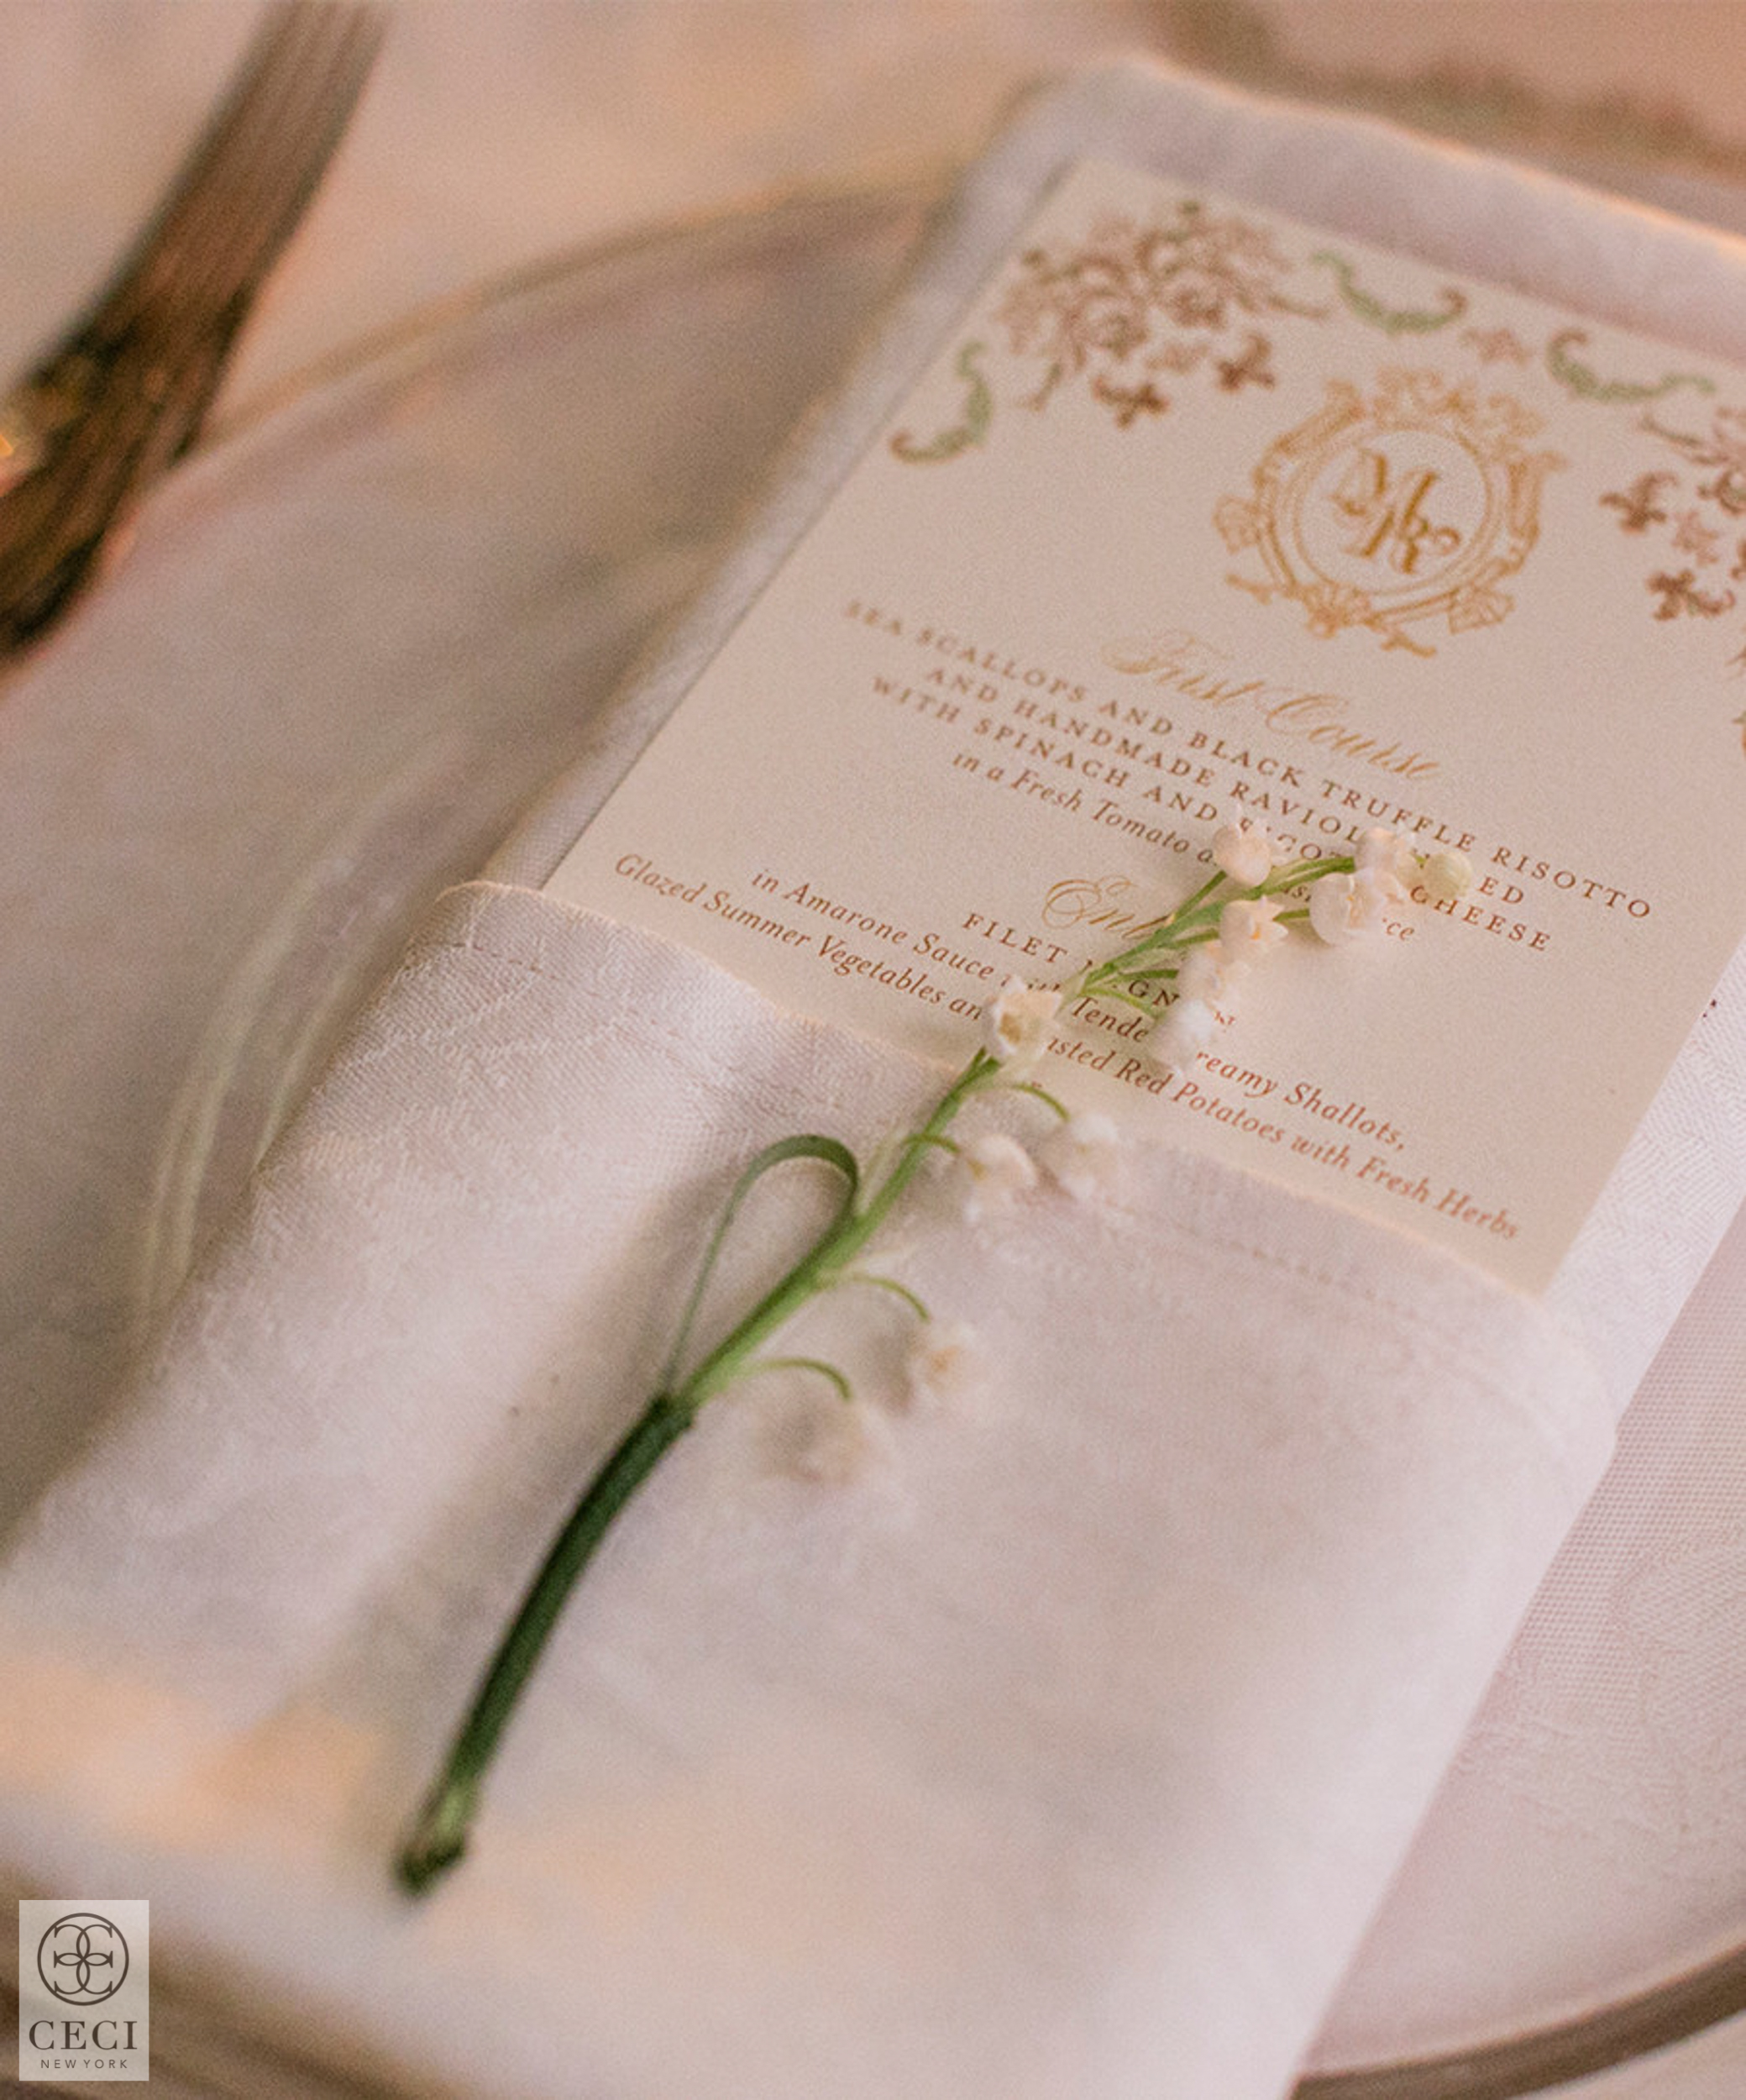 Ceci_New_York_Wedding_Lake_Como_Italy_Luxury_Style_Custom_Invitation.jpg